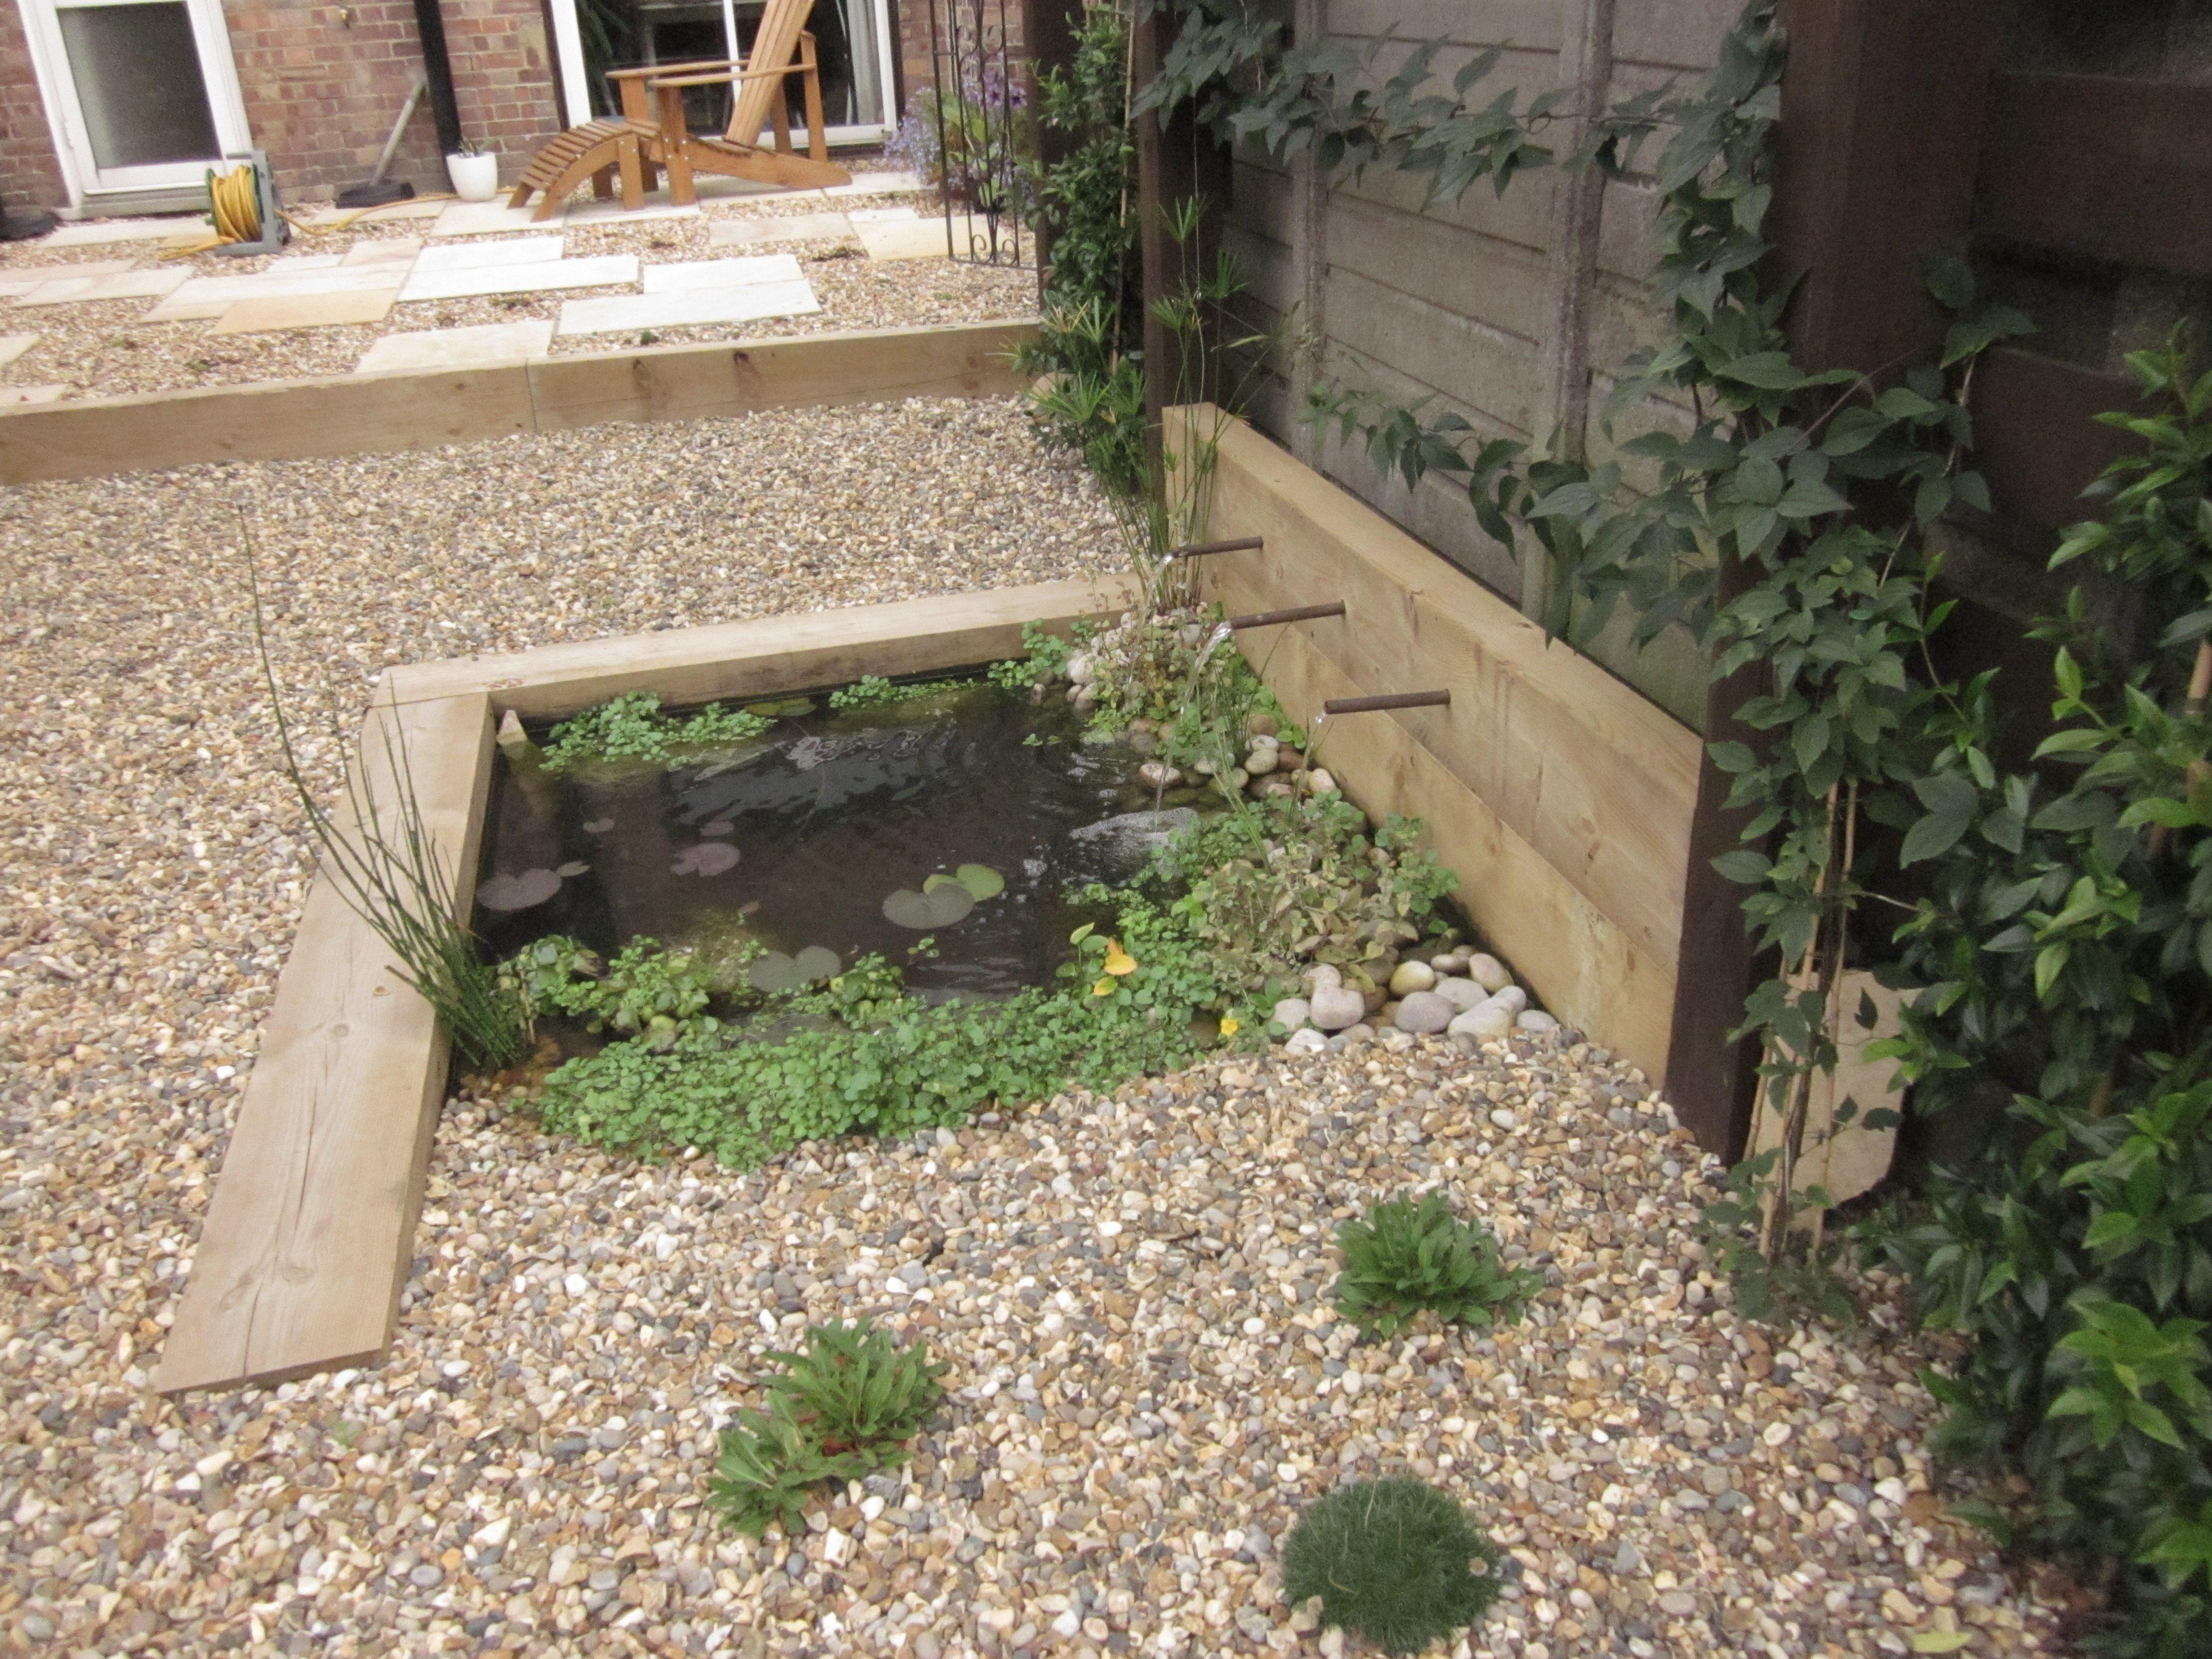 Garden Design Top Tips: Something to Pond-er... - Earth ...